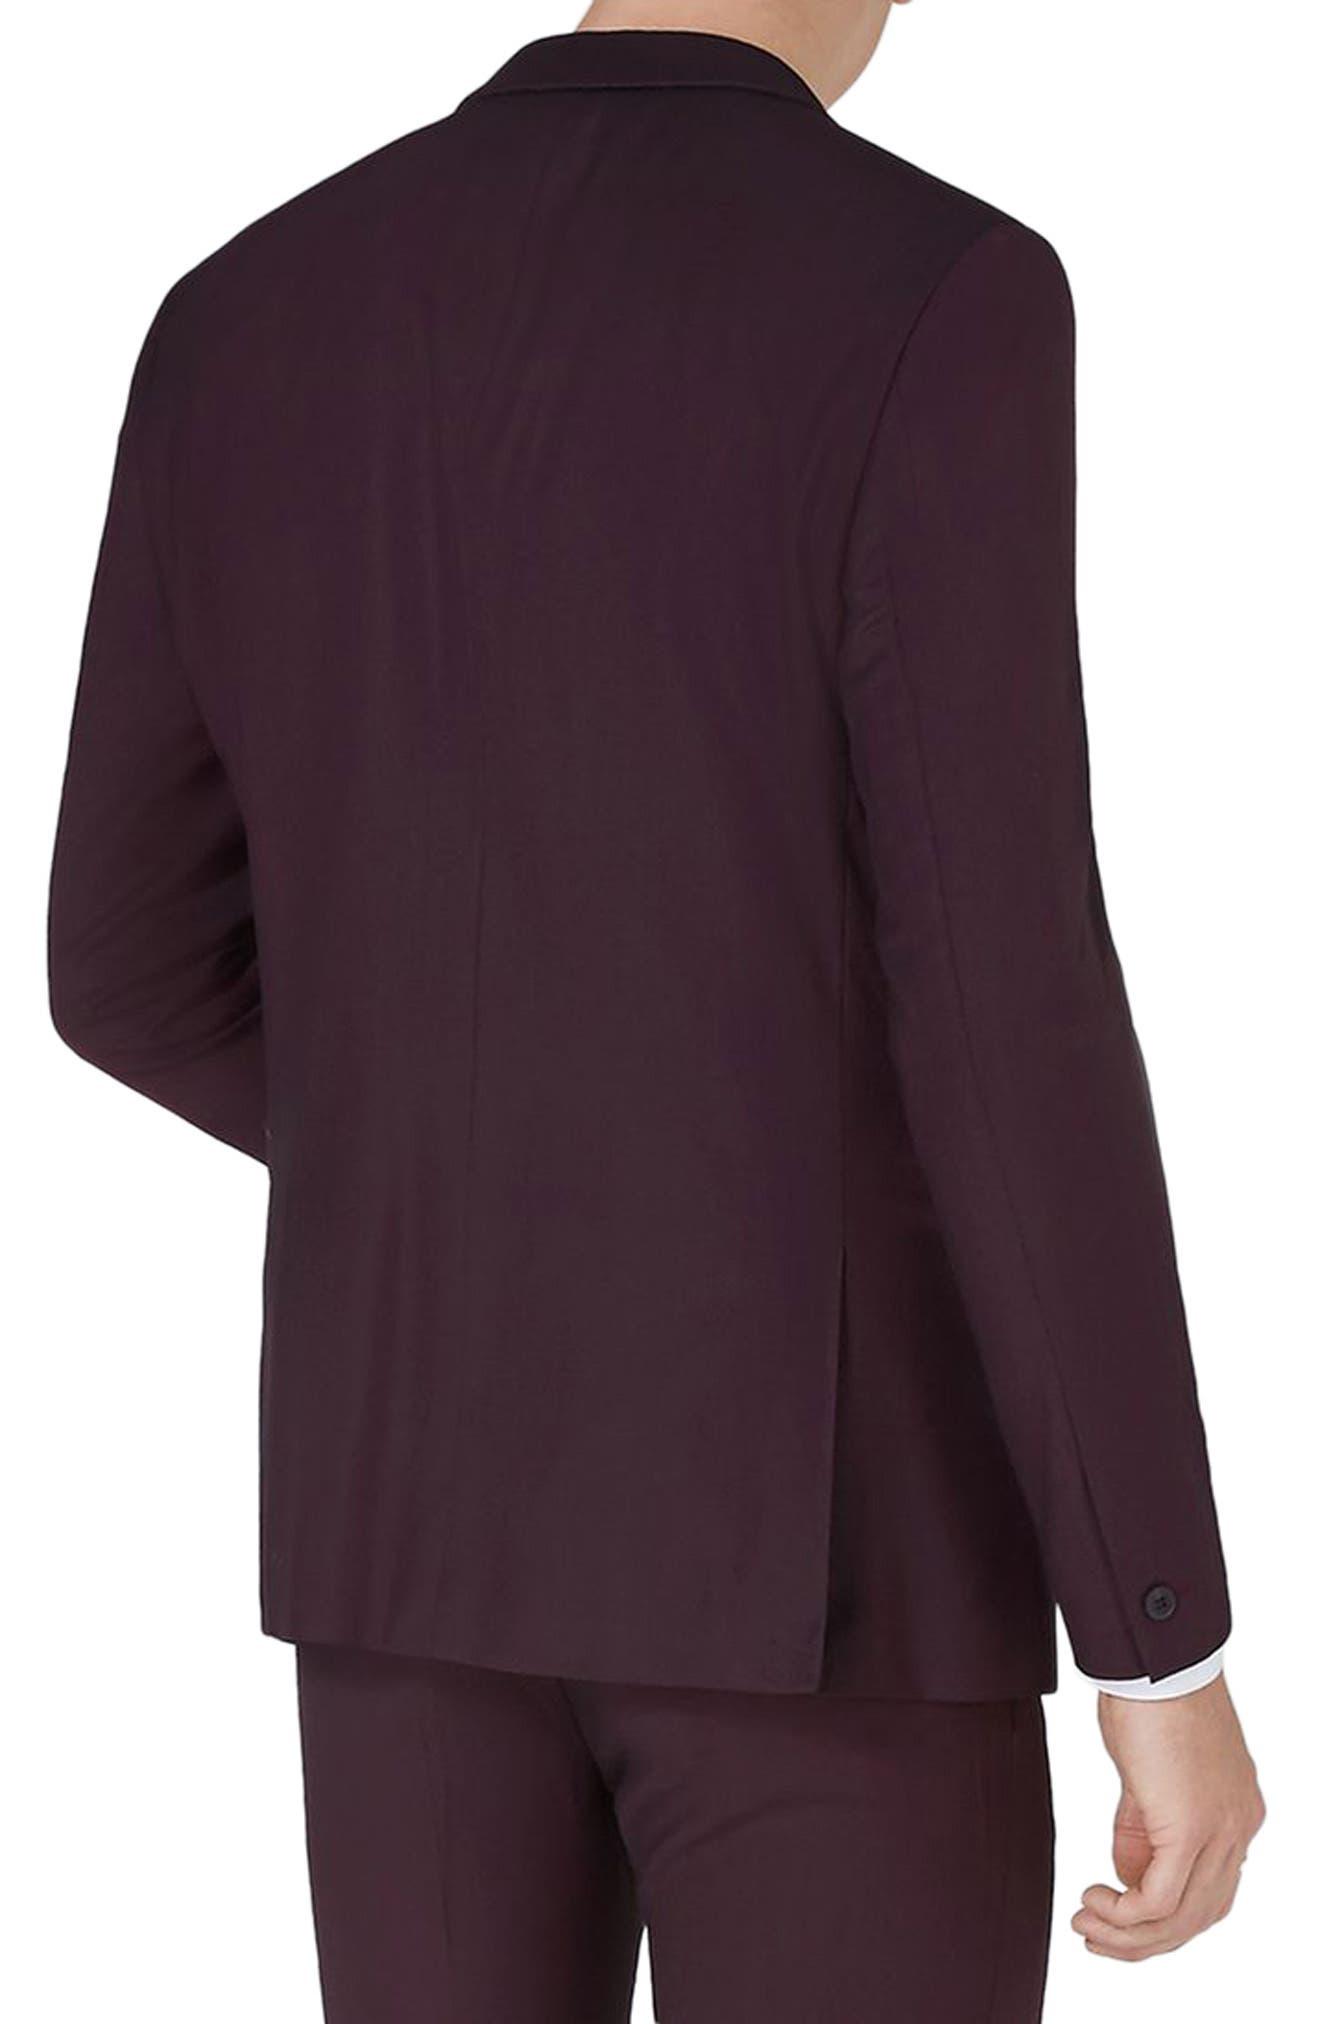 Skinny Fit Plum One-Button Suit Jacket,                             Alternate thumbnail 2, color,                             500